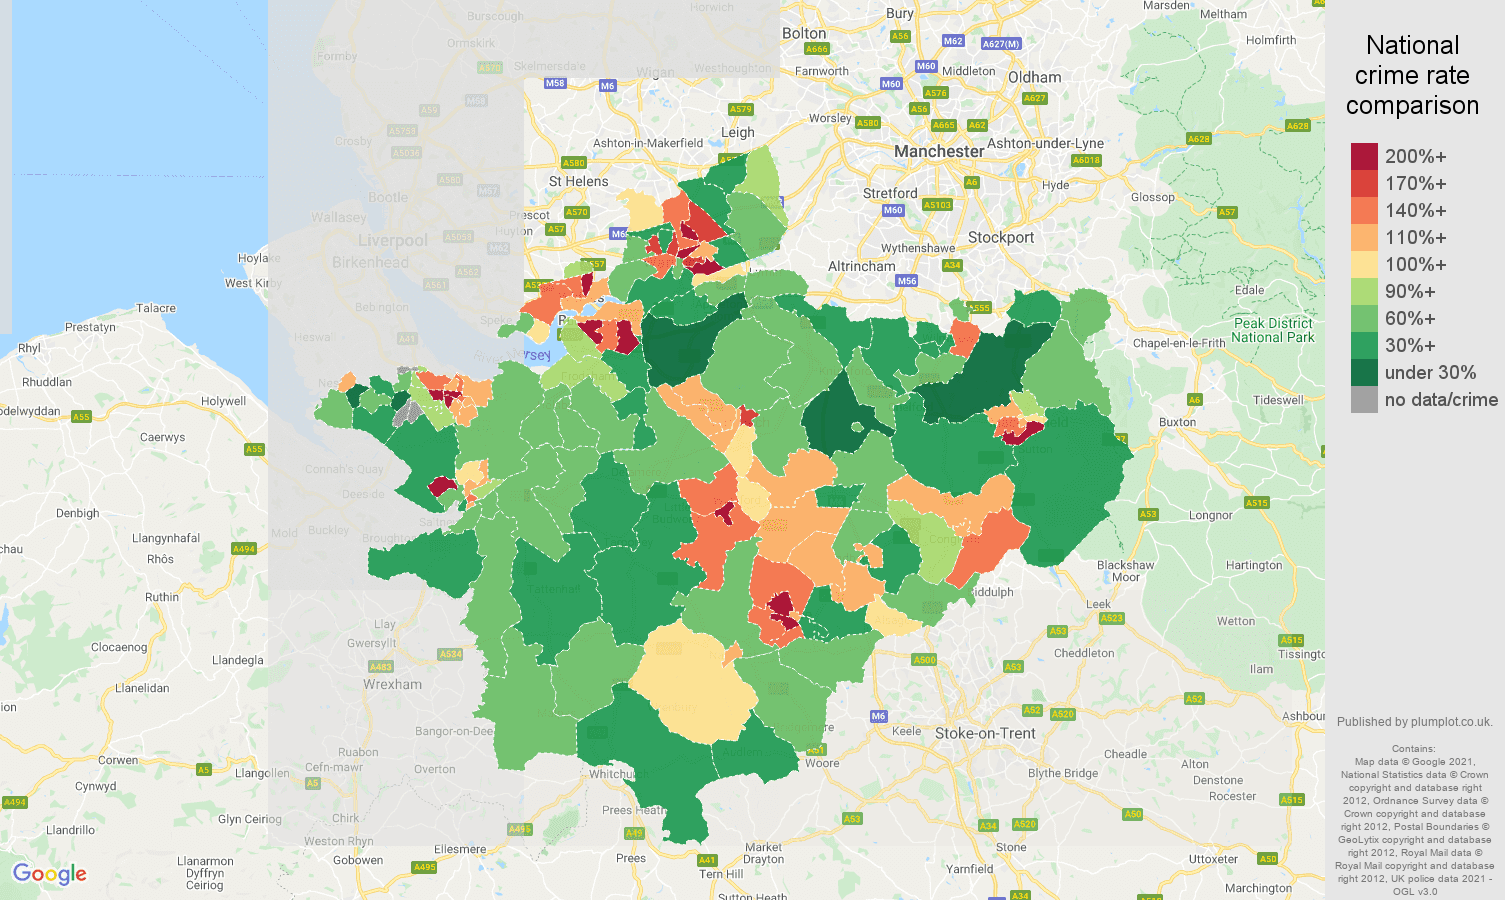 Cheshire violent crime rate comparison map